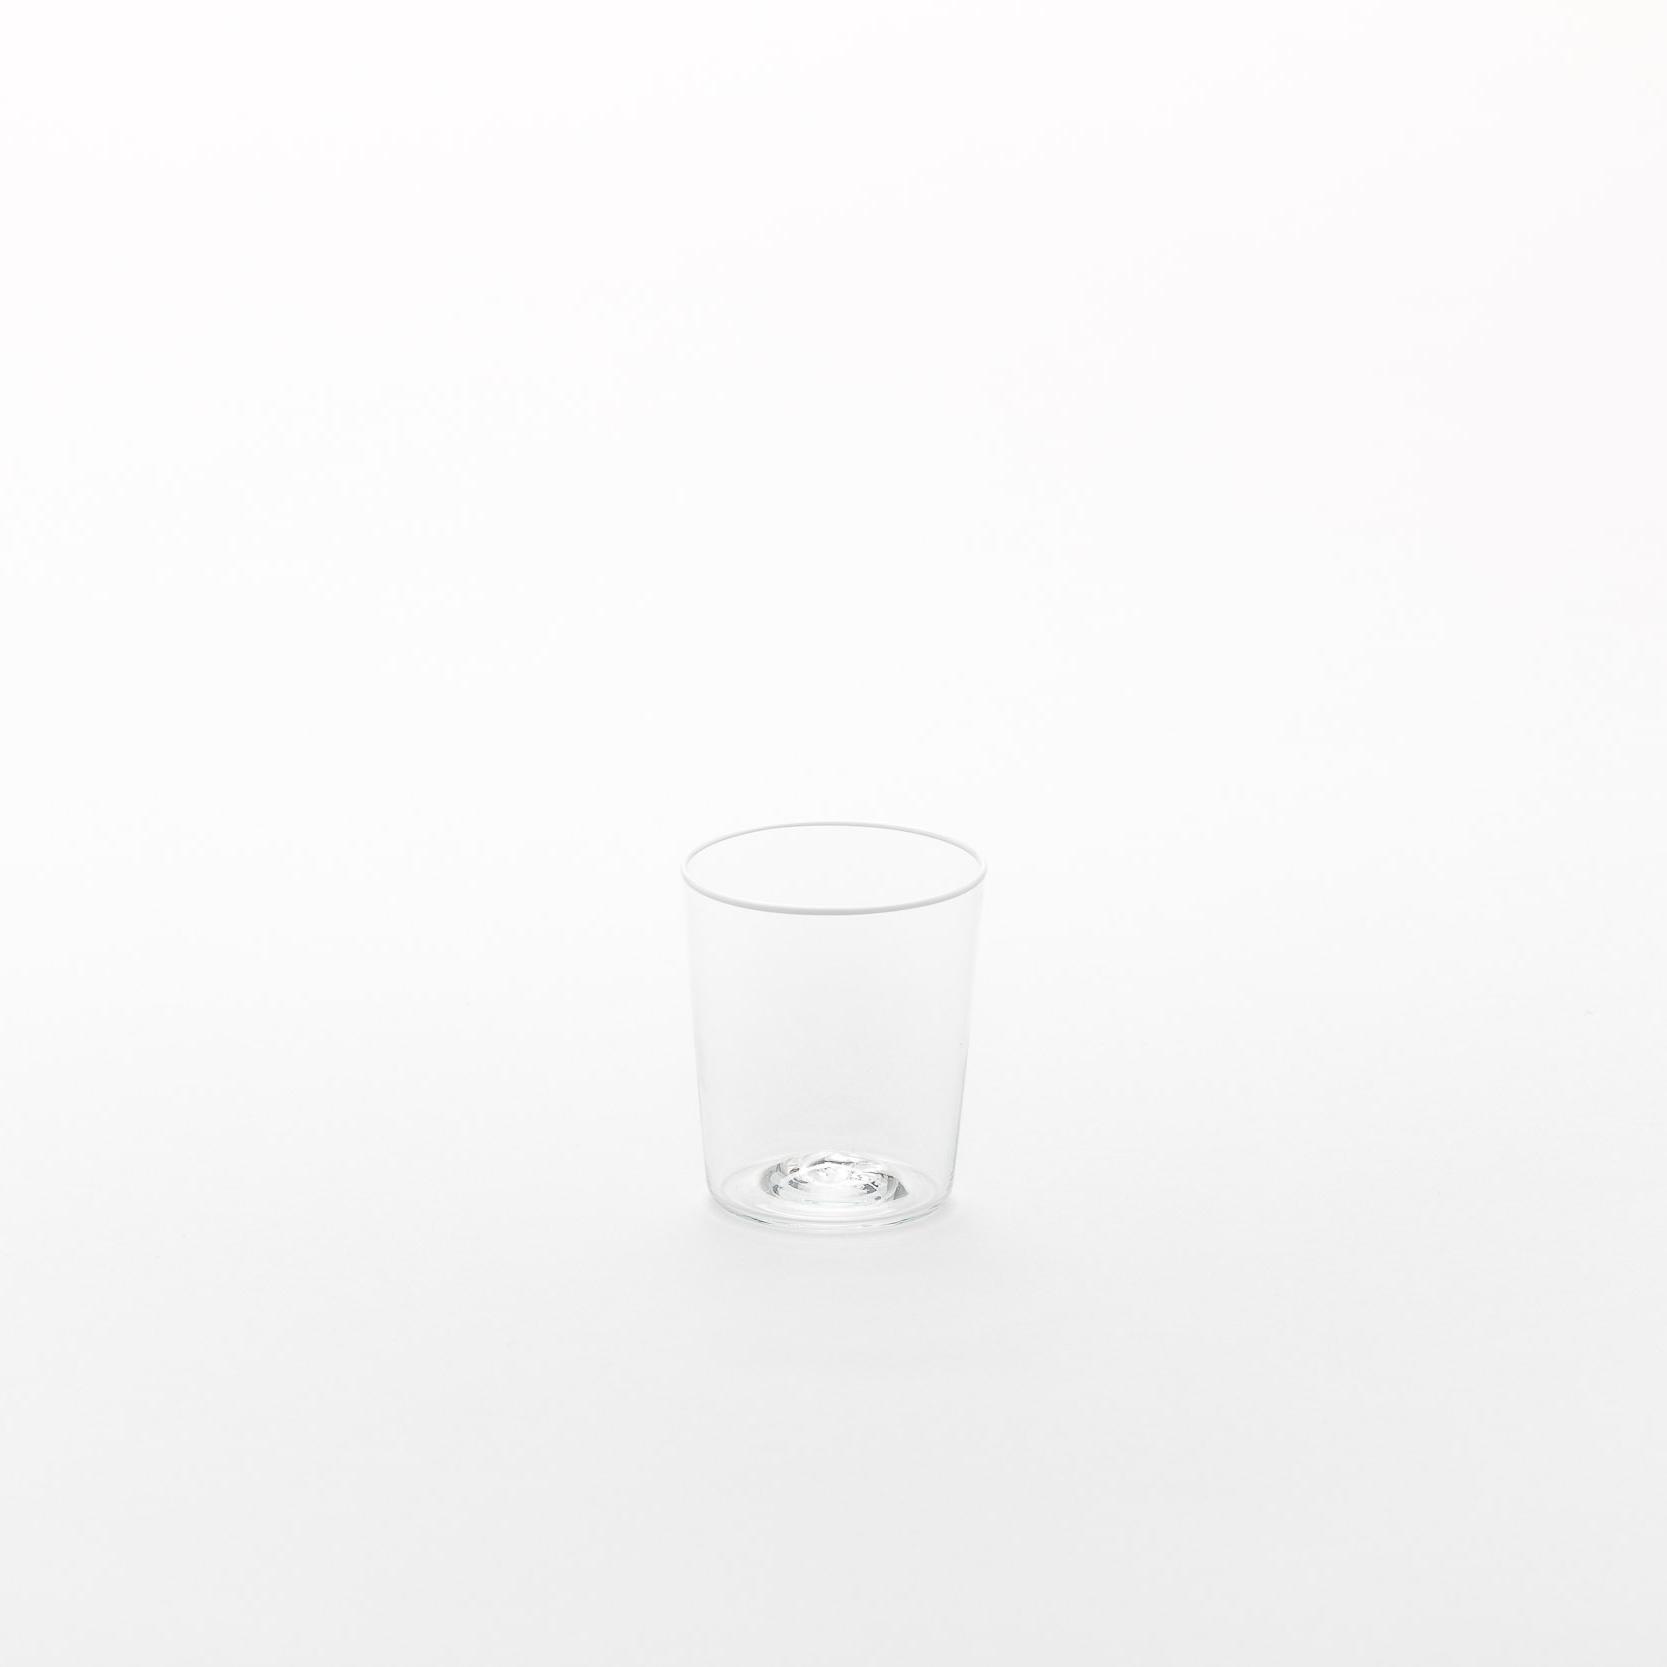 YALI-OMBRA-GLASS-CRISTALLO-WHITE-2.jpg